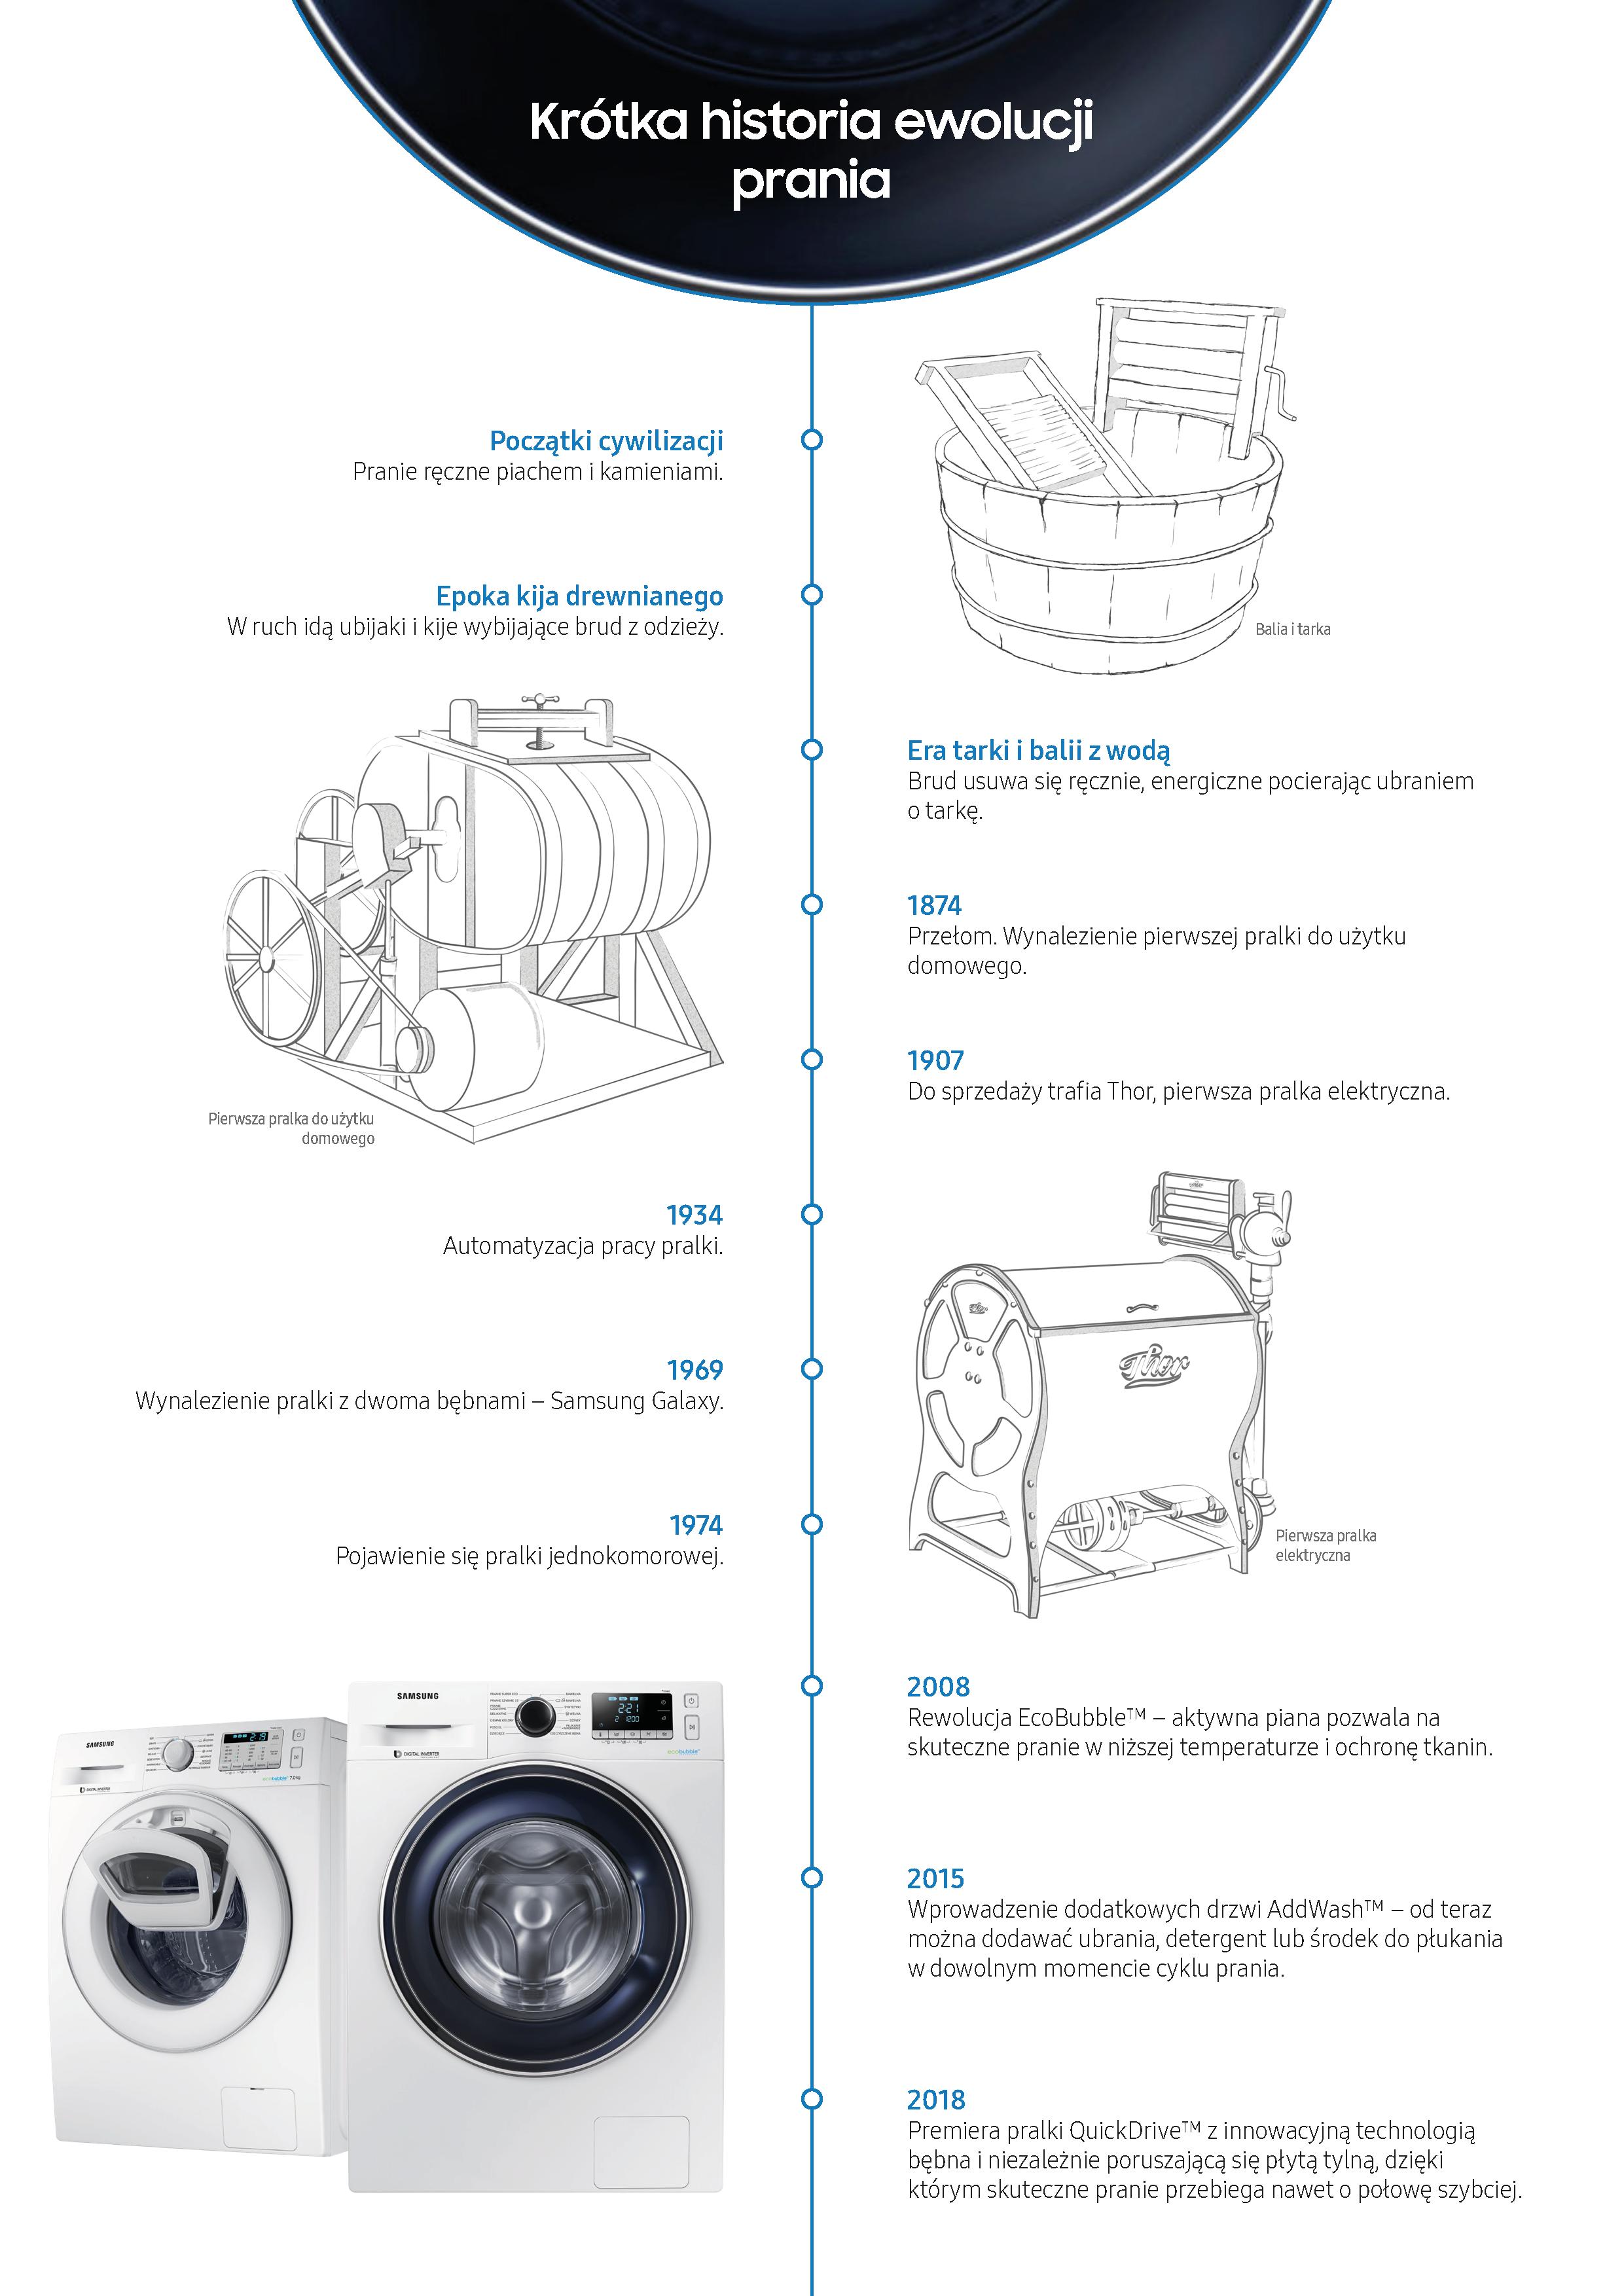 krotka_historia_ewolucji_prania_Samsung_QuickDrive